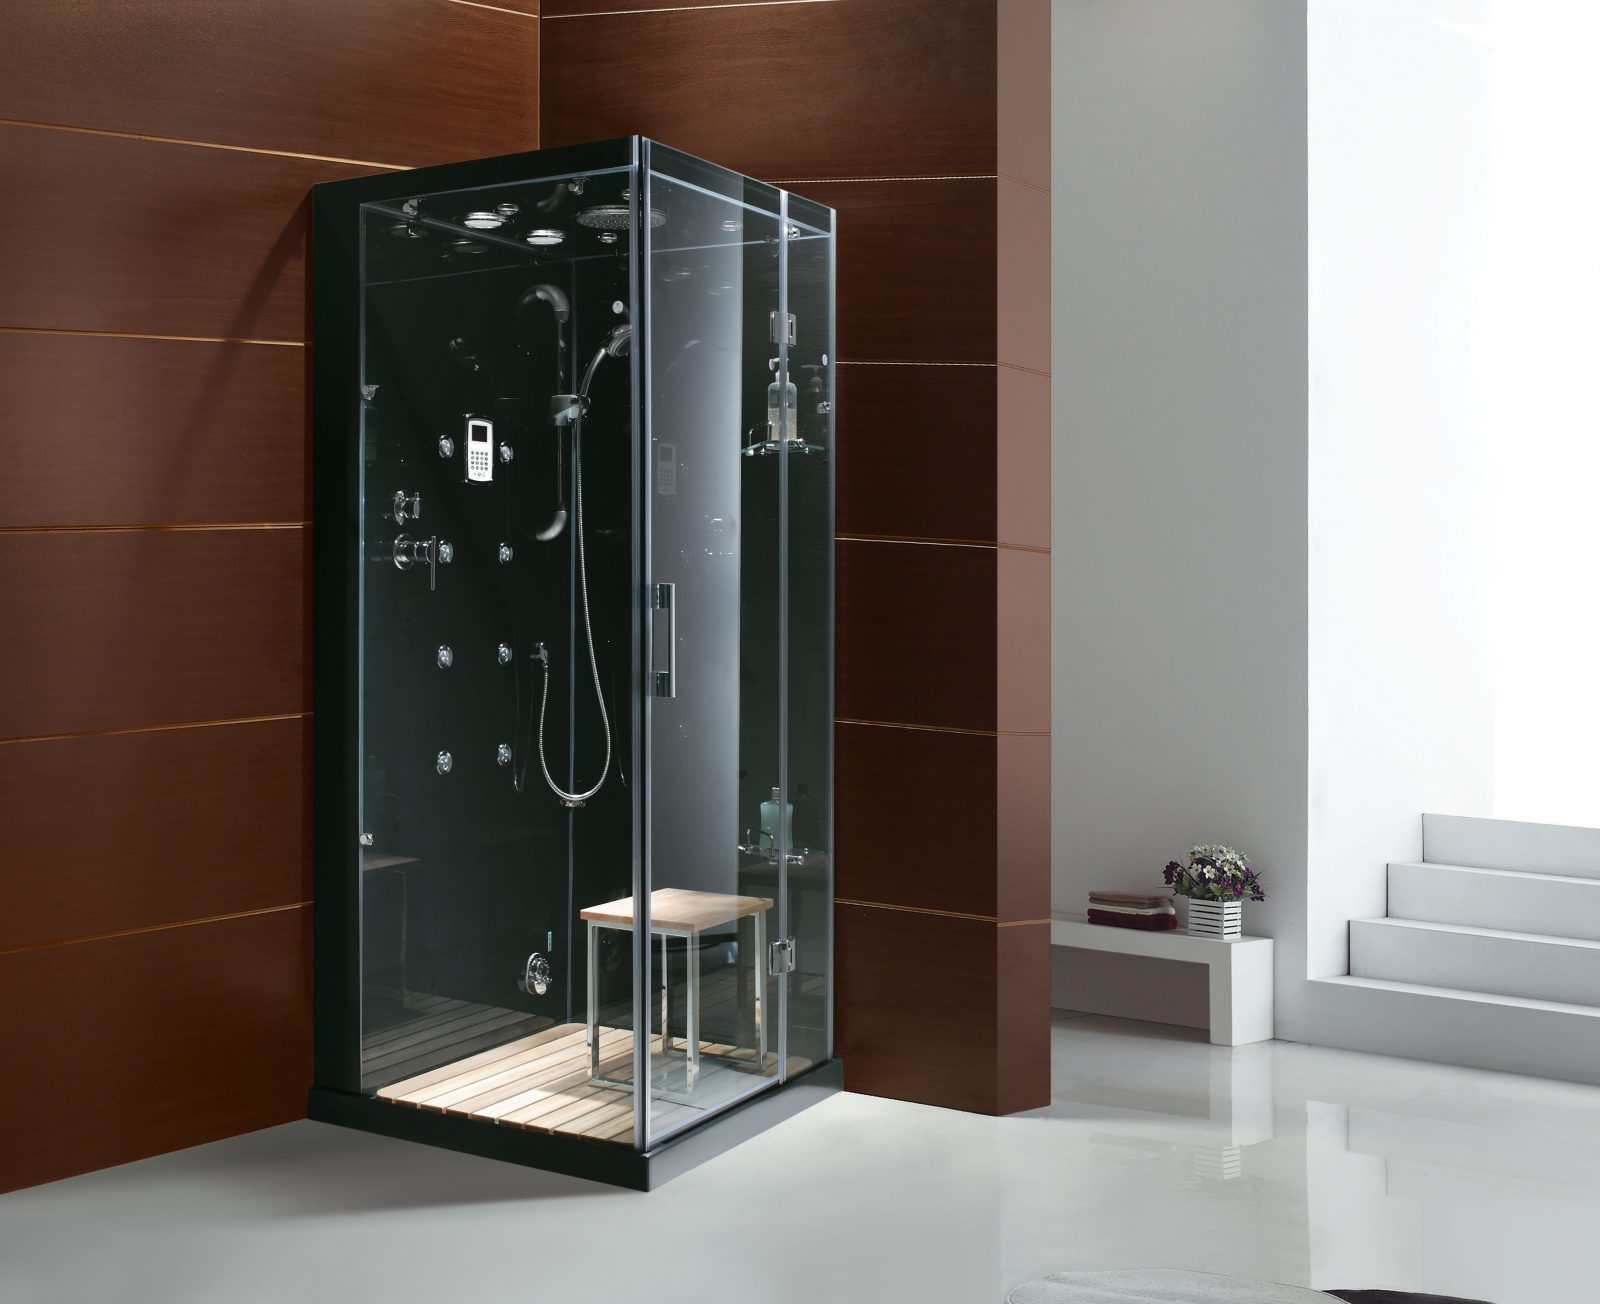 jupiter steam showers buy online at homeward bath jupiter steam shower in black